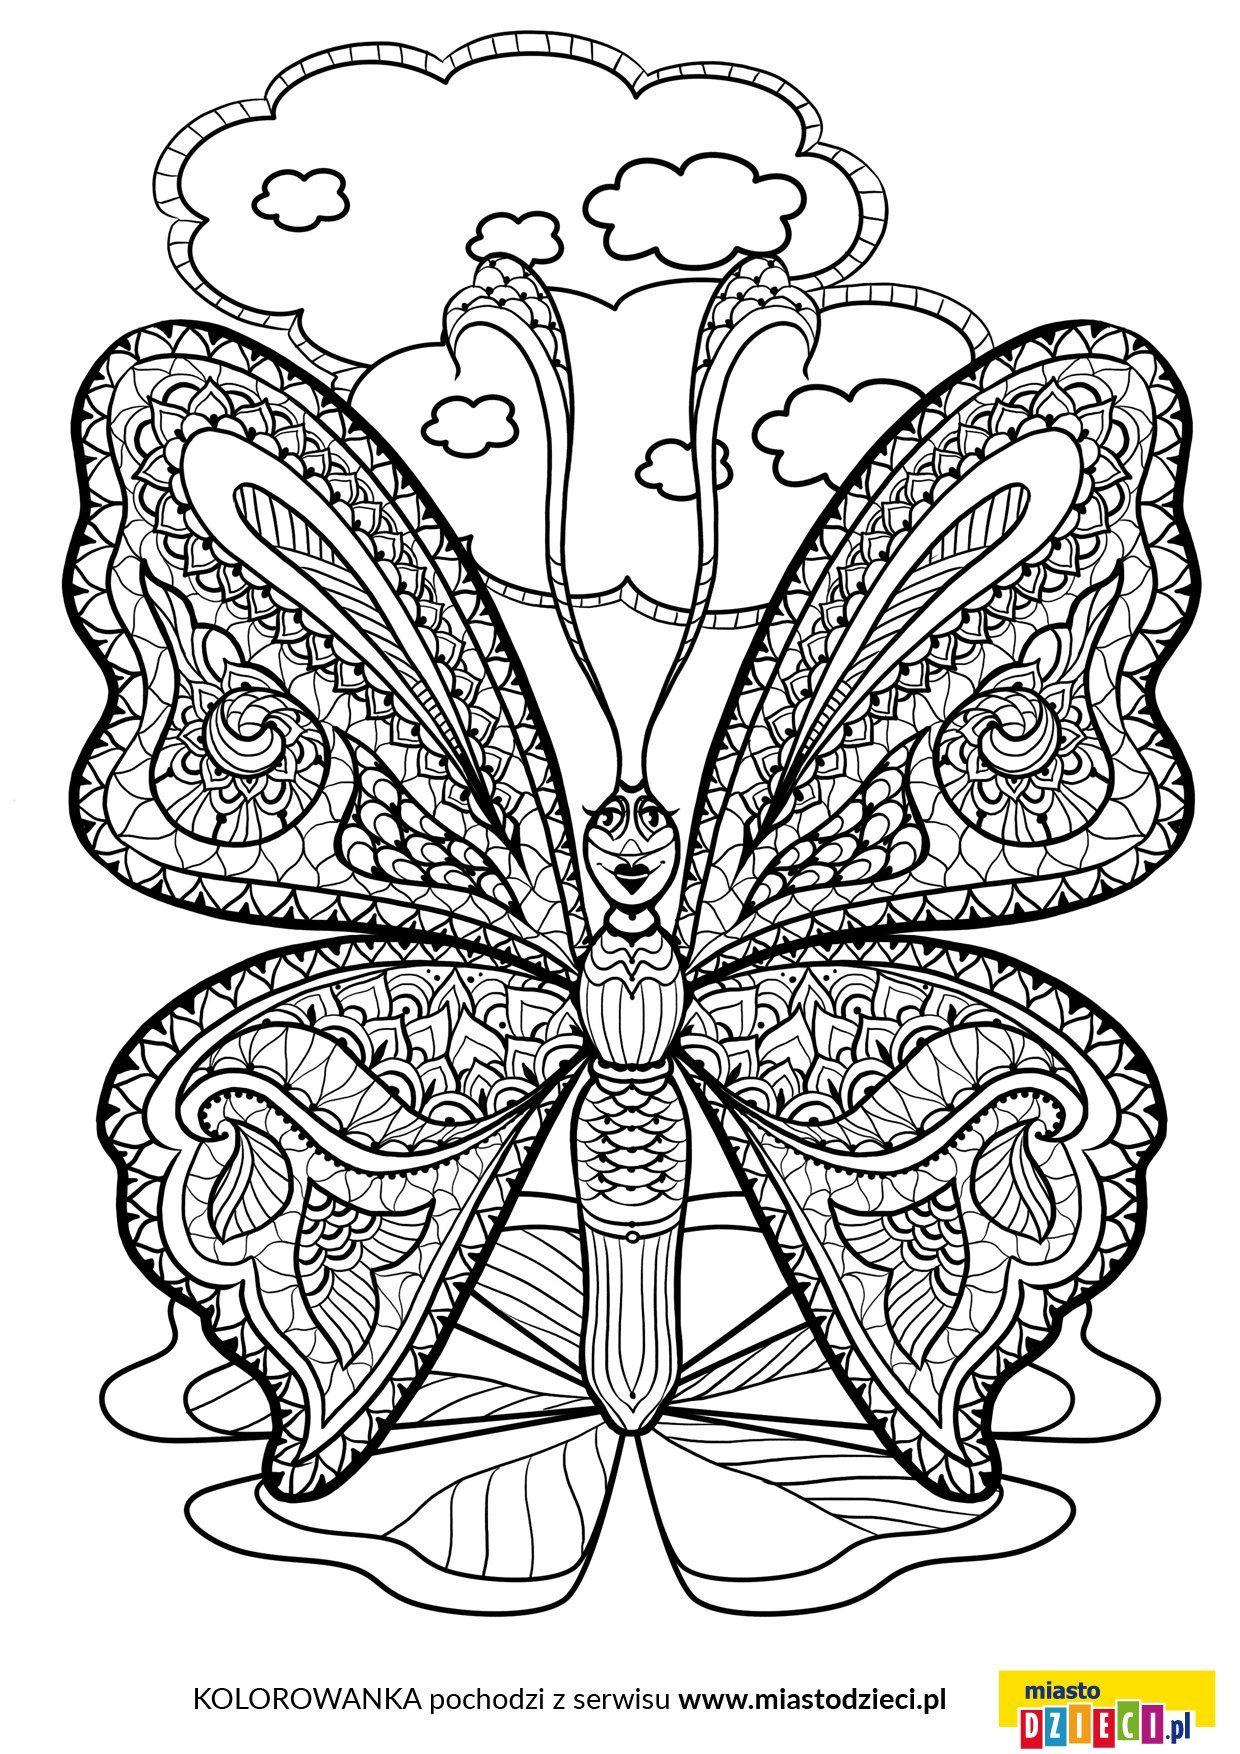 Kolorowanki Antystresowe Motyl Jpg 1240 1754 Mandala Floral Color